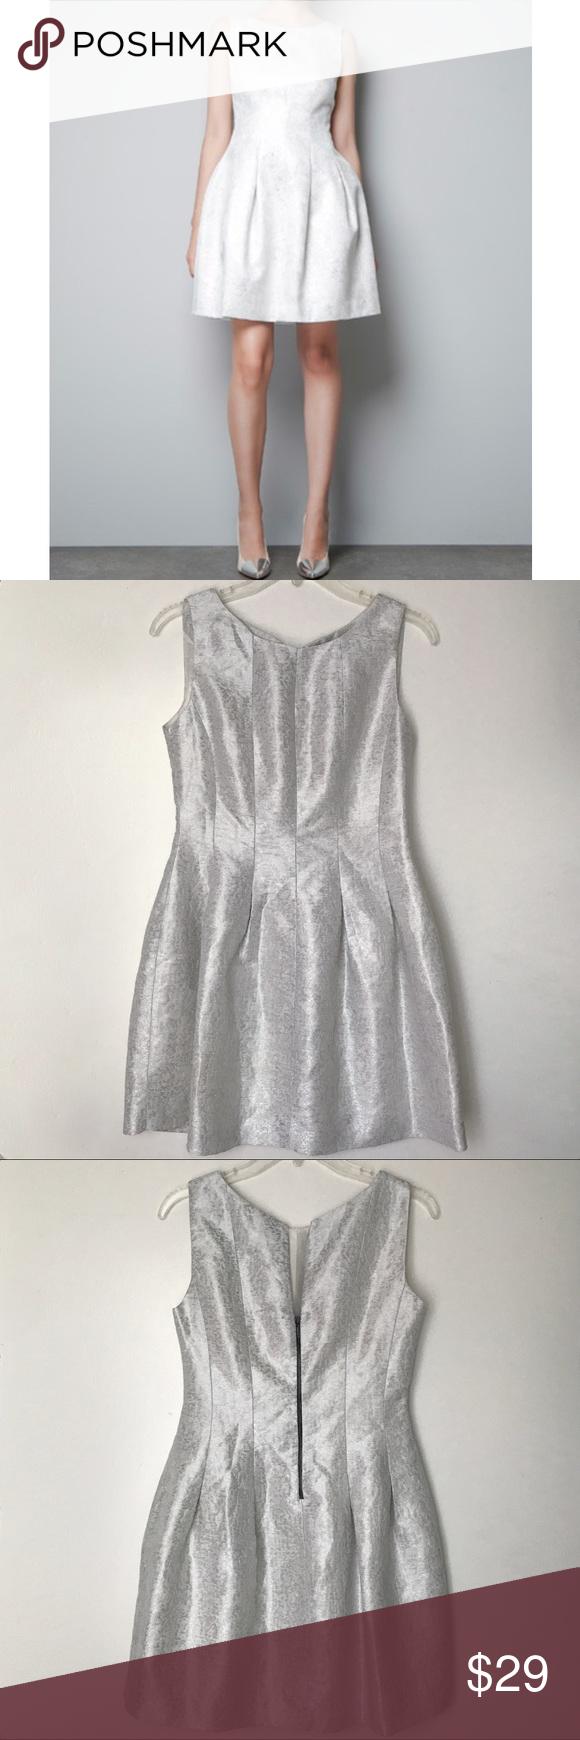 Zara Silver White Medium Tulip Dress Zara Silvery White Tulip Dress Size Medium Short Sleeveless Jacquard Print Fashion Clothes Design Fashion Design [ 1740 x 580 Pixel ]